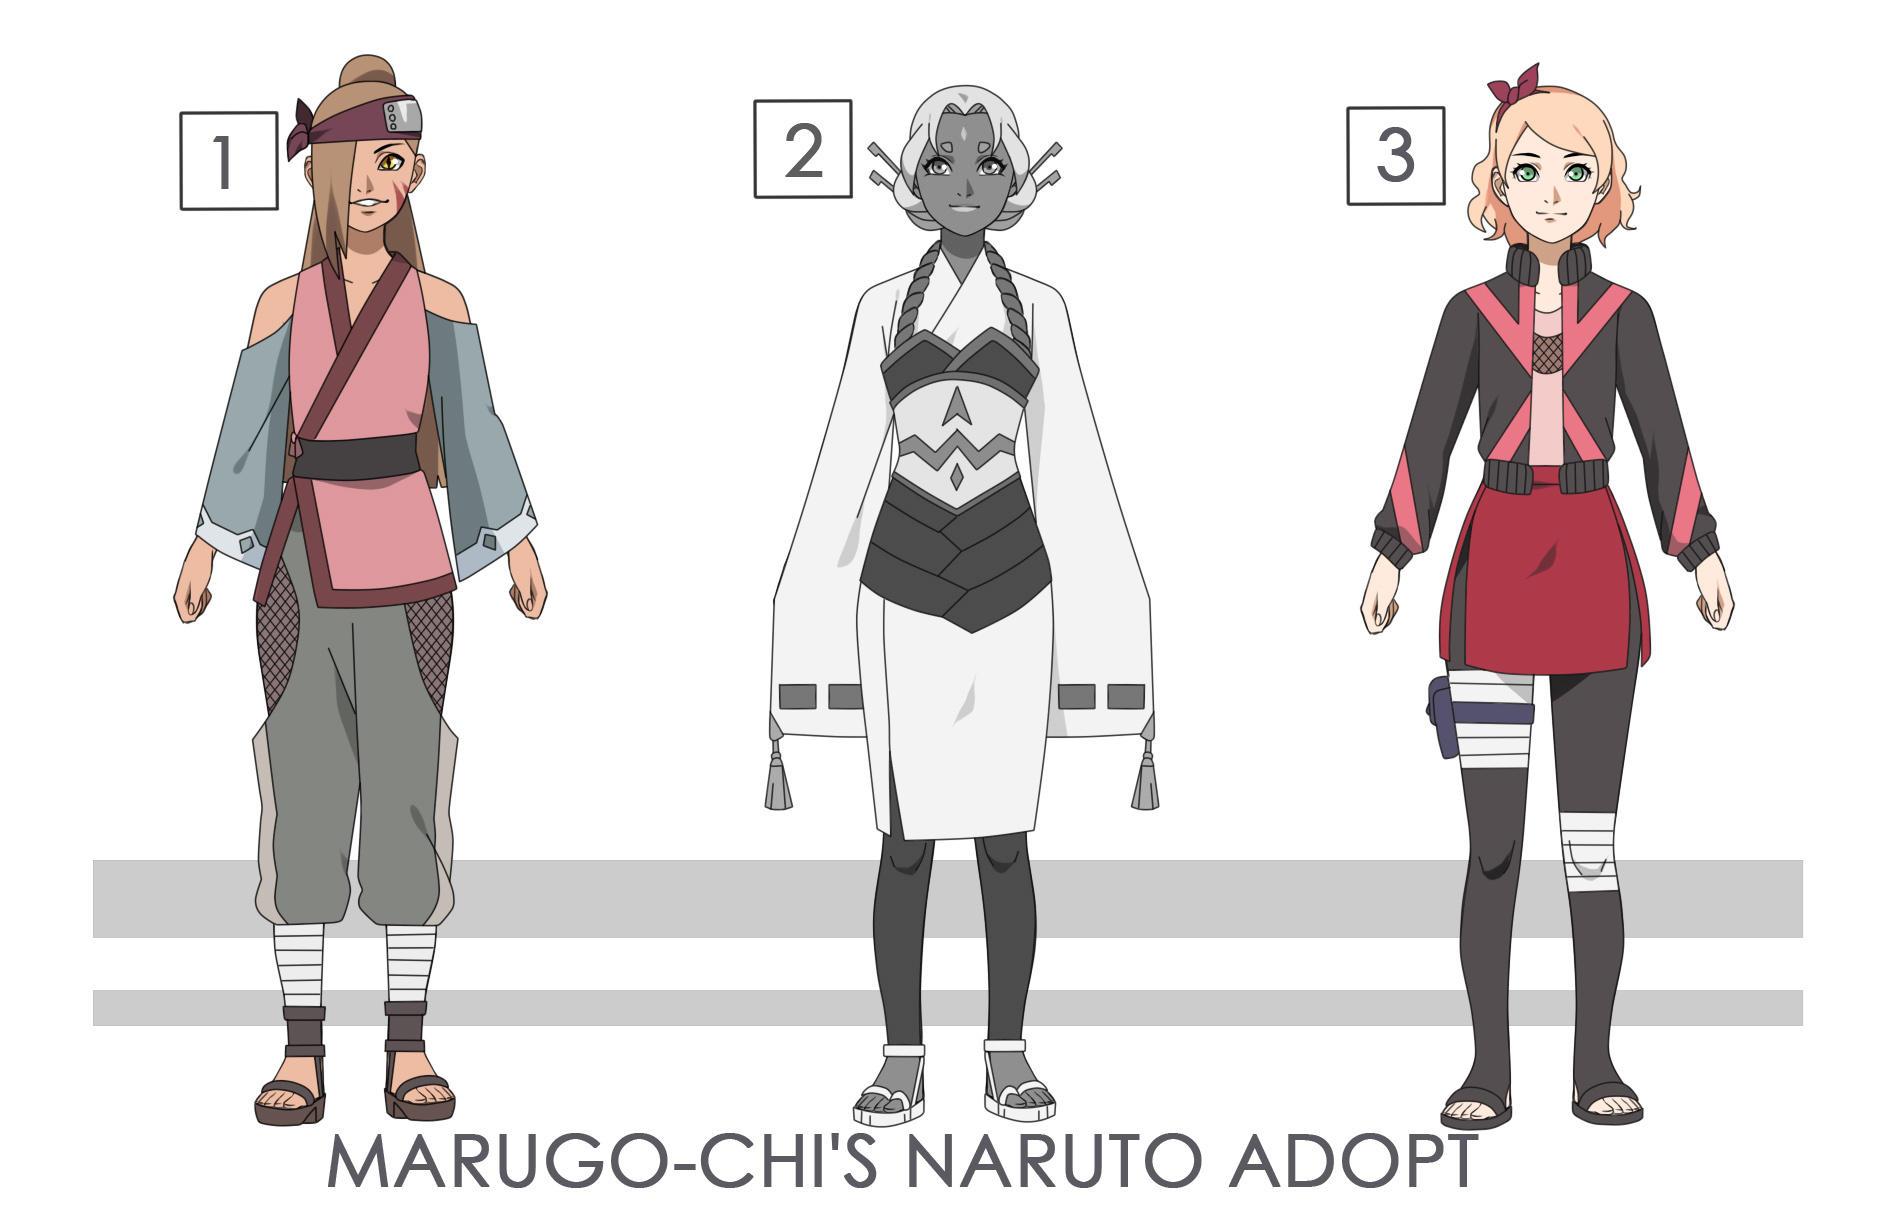 MARUGO-CHI'S Naruto Adoptable Set Price - [OPEN] by marugo-chi